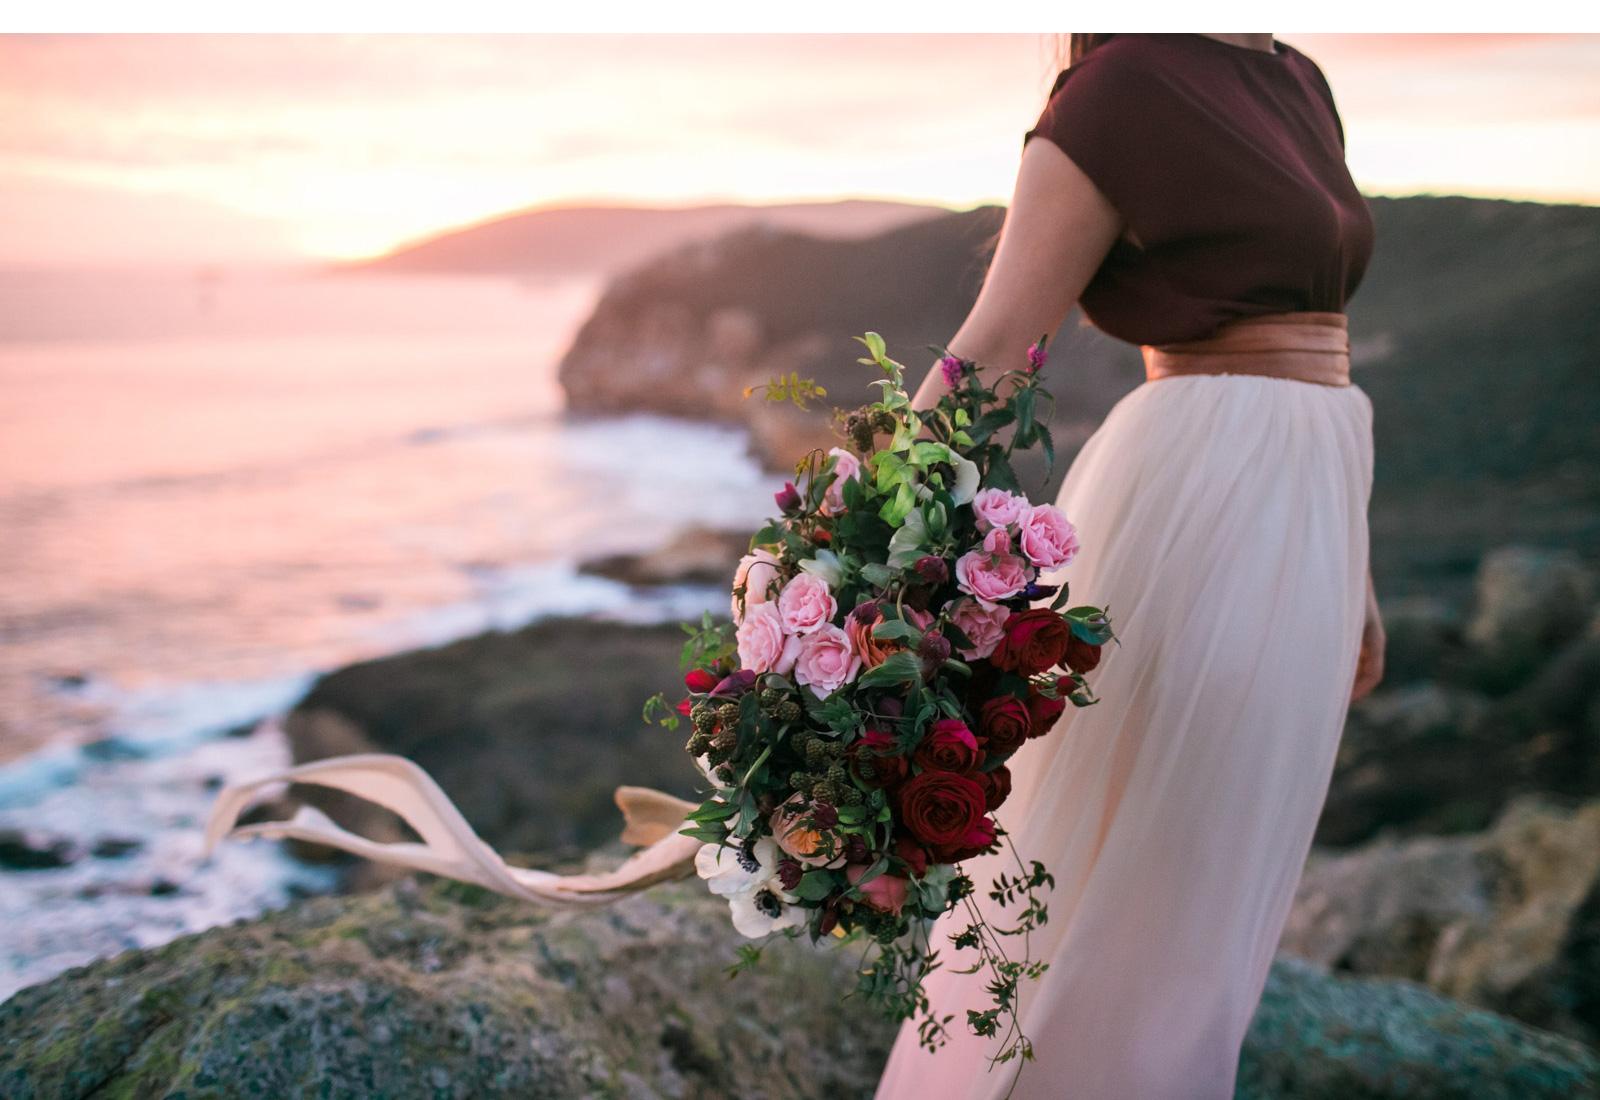 Central-Coast-Wedding-Photographer-Natalie-Schutt-Photography_05.jpg